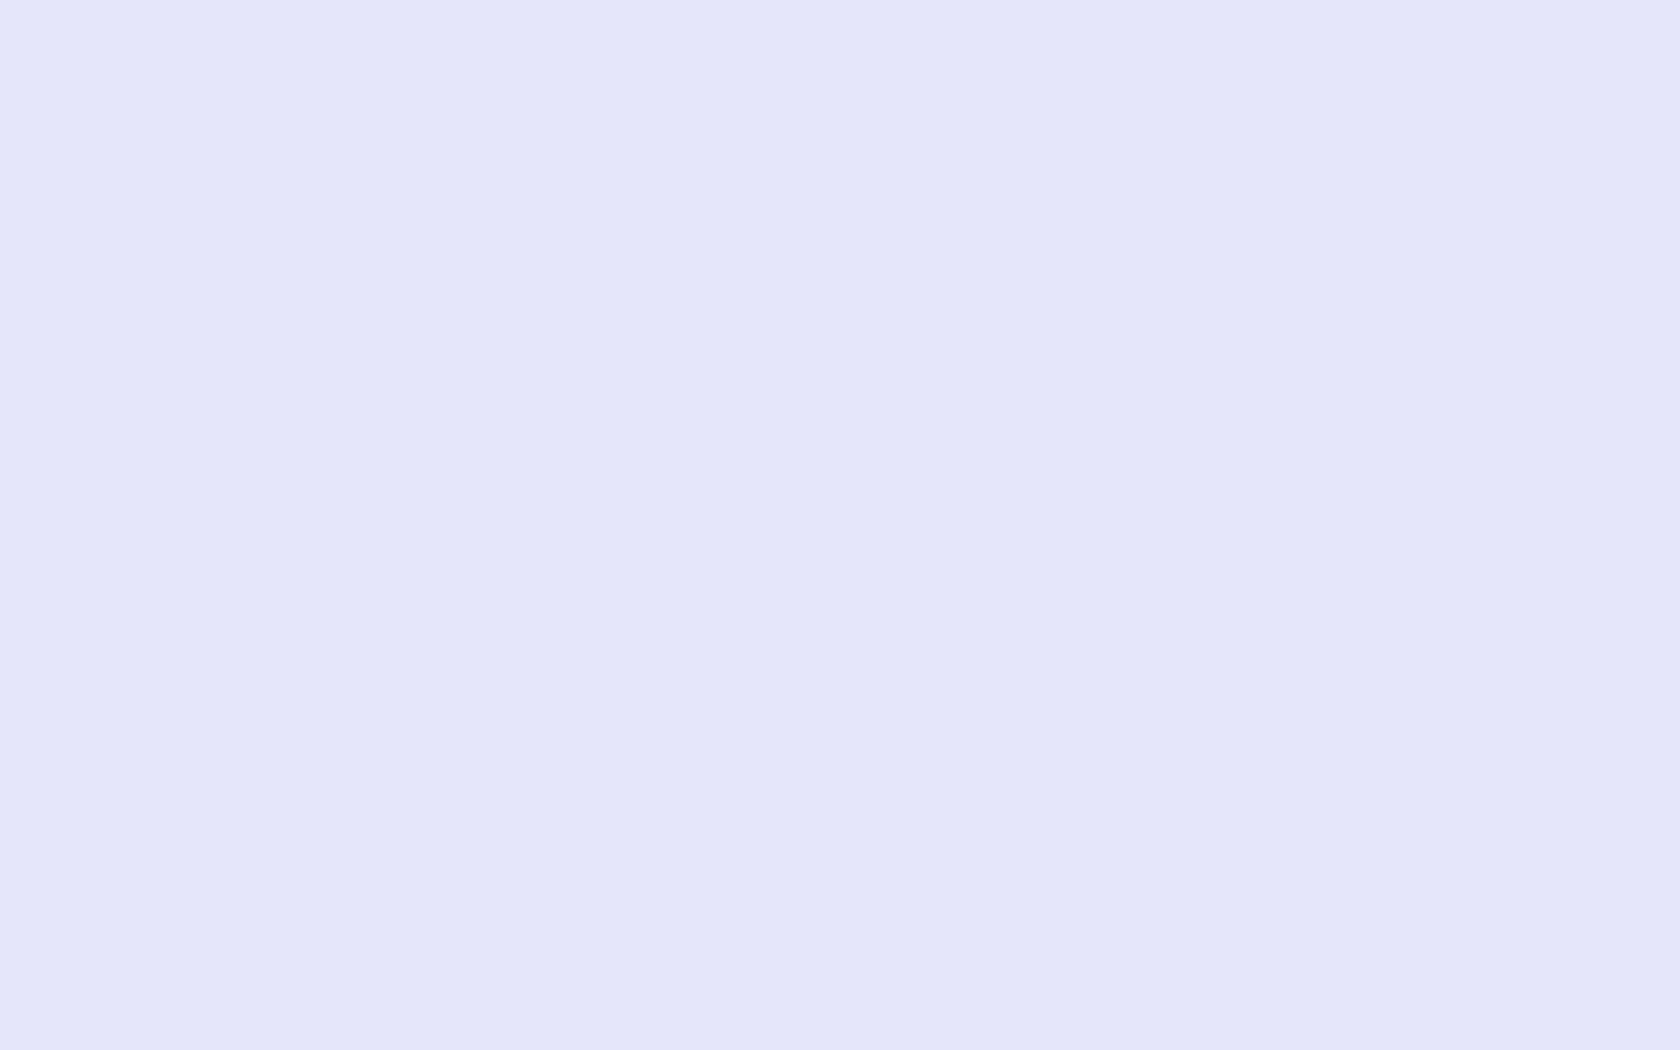 1680x1050 Lavender Web Solid Color Background